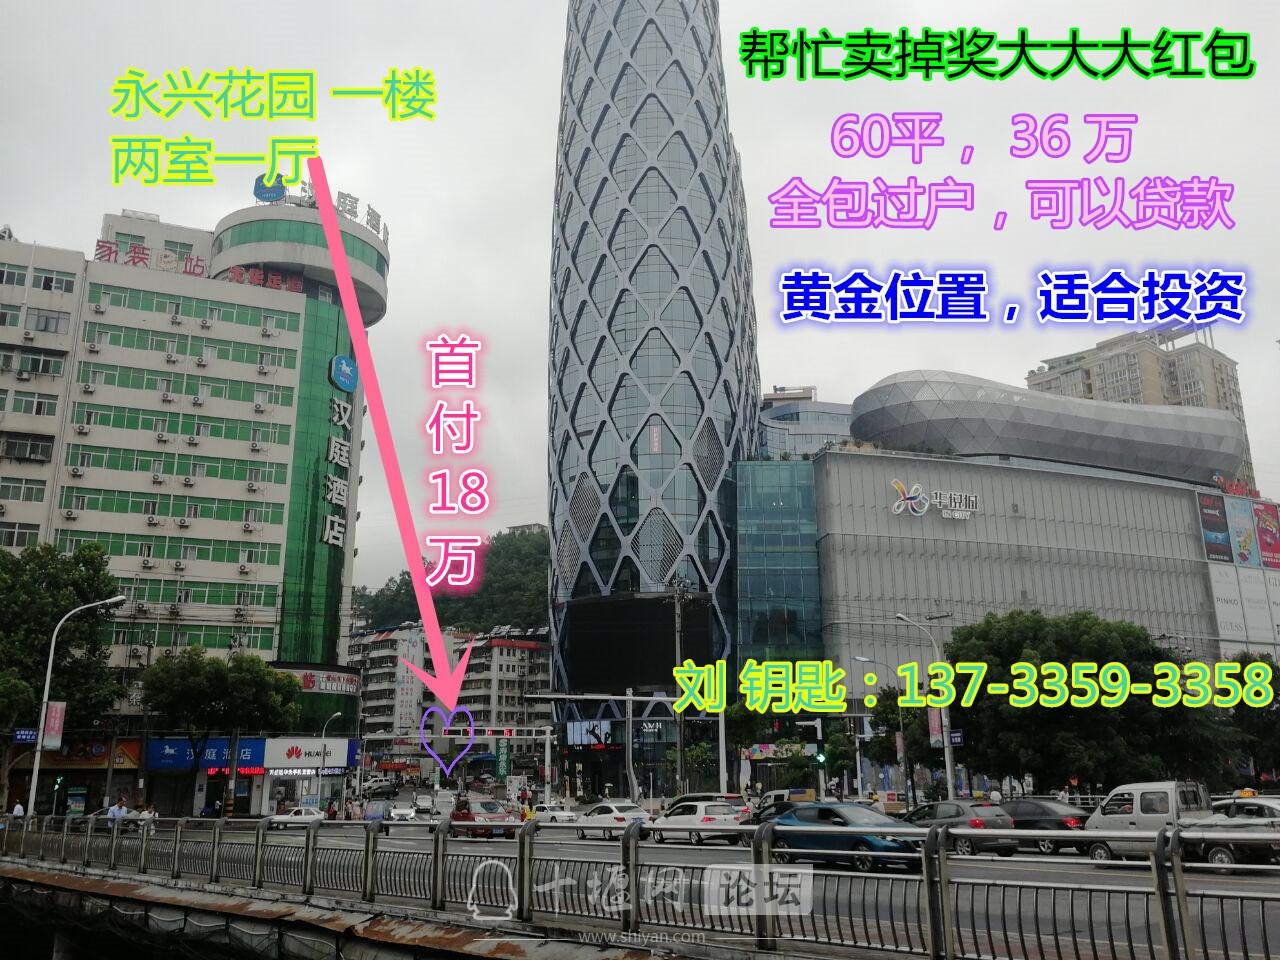 3B6F477_副本.jpg